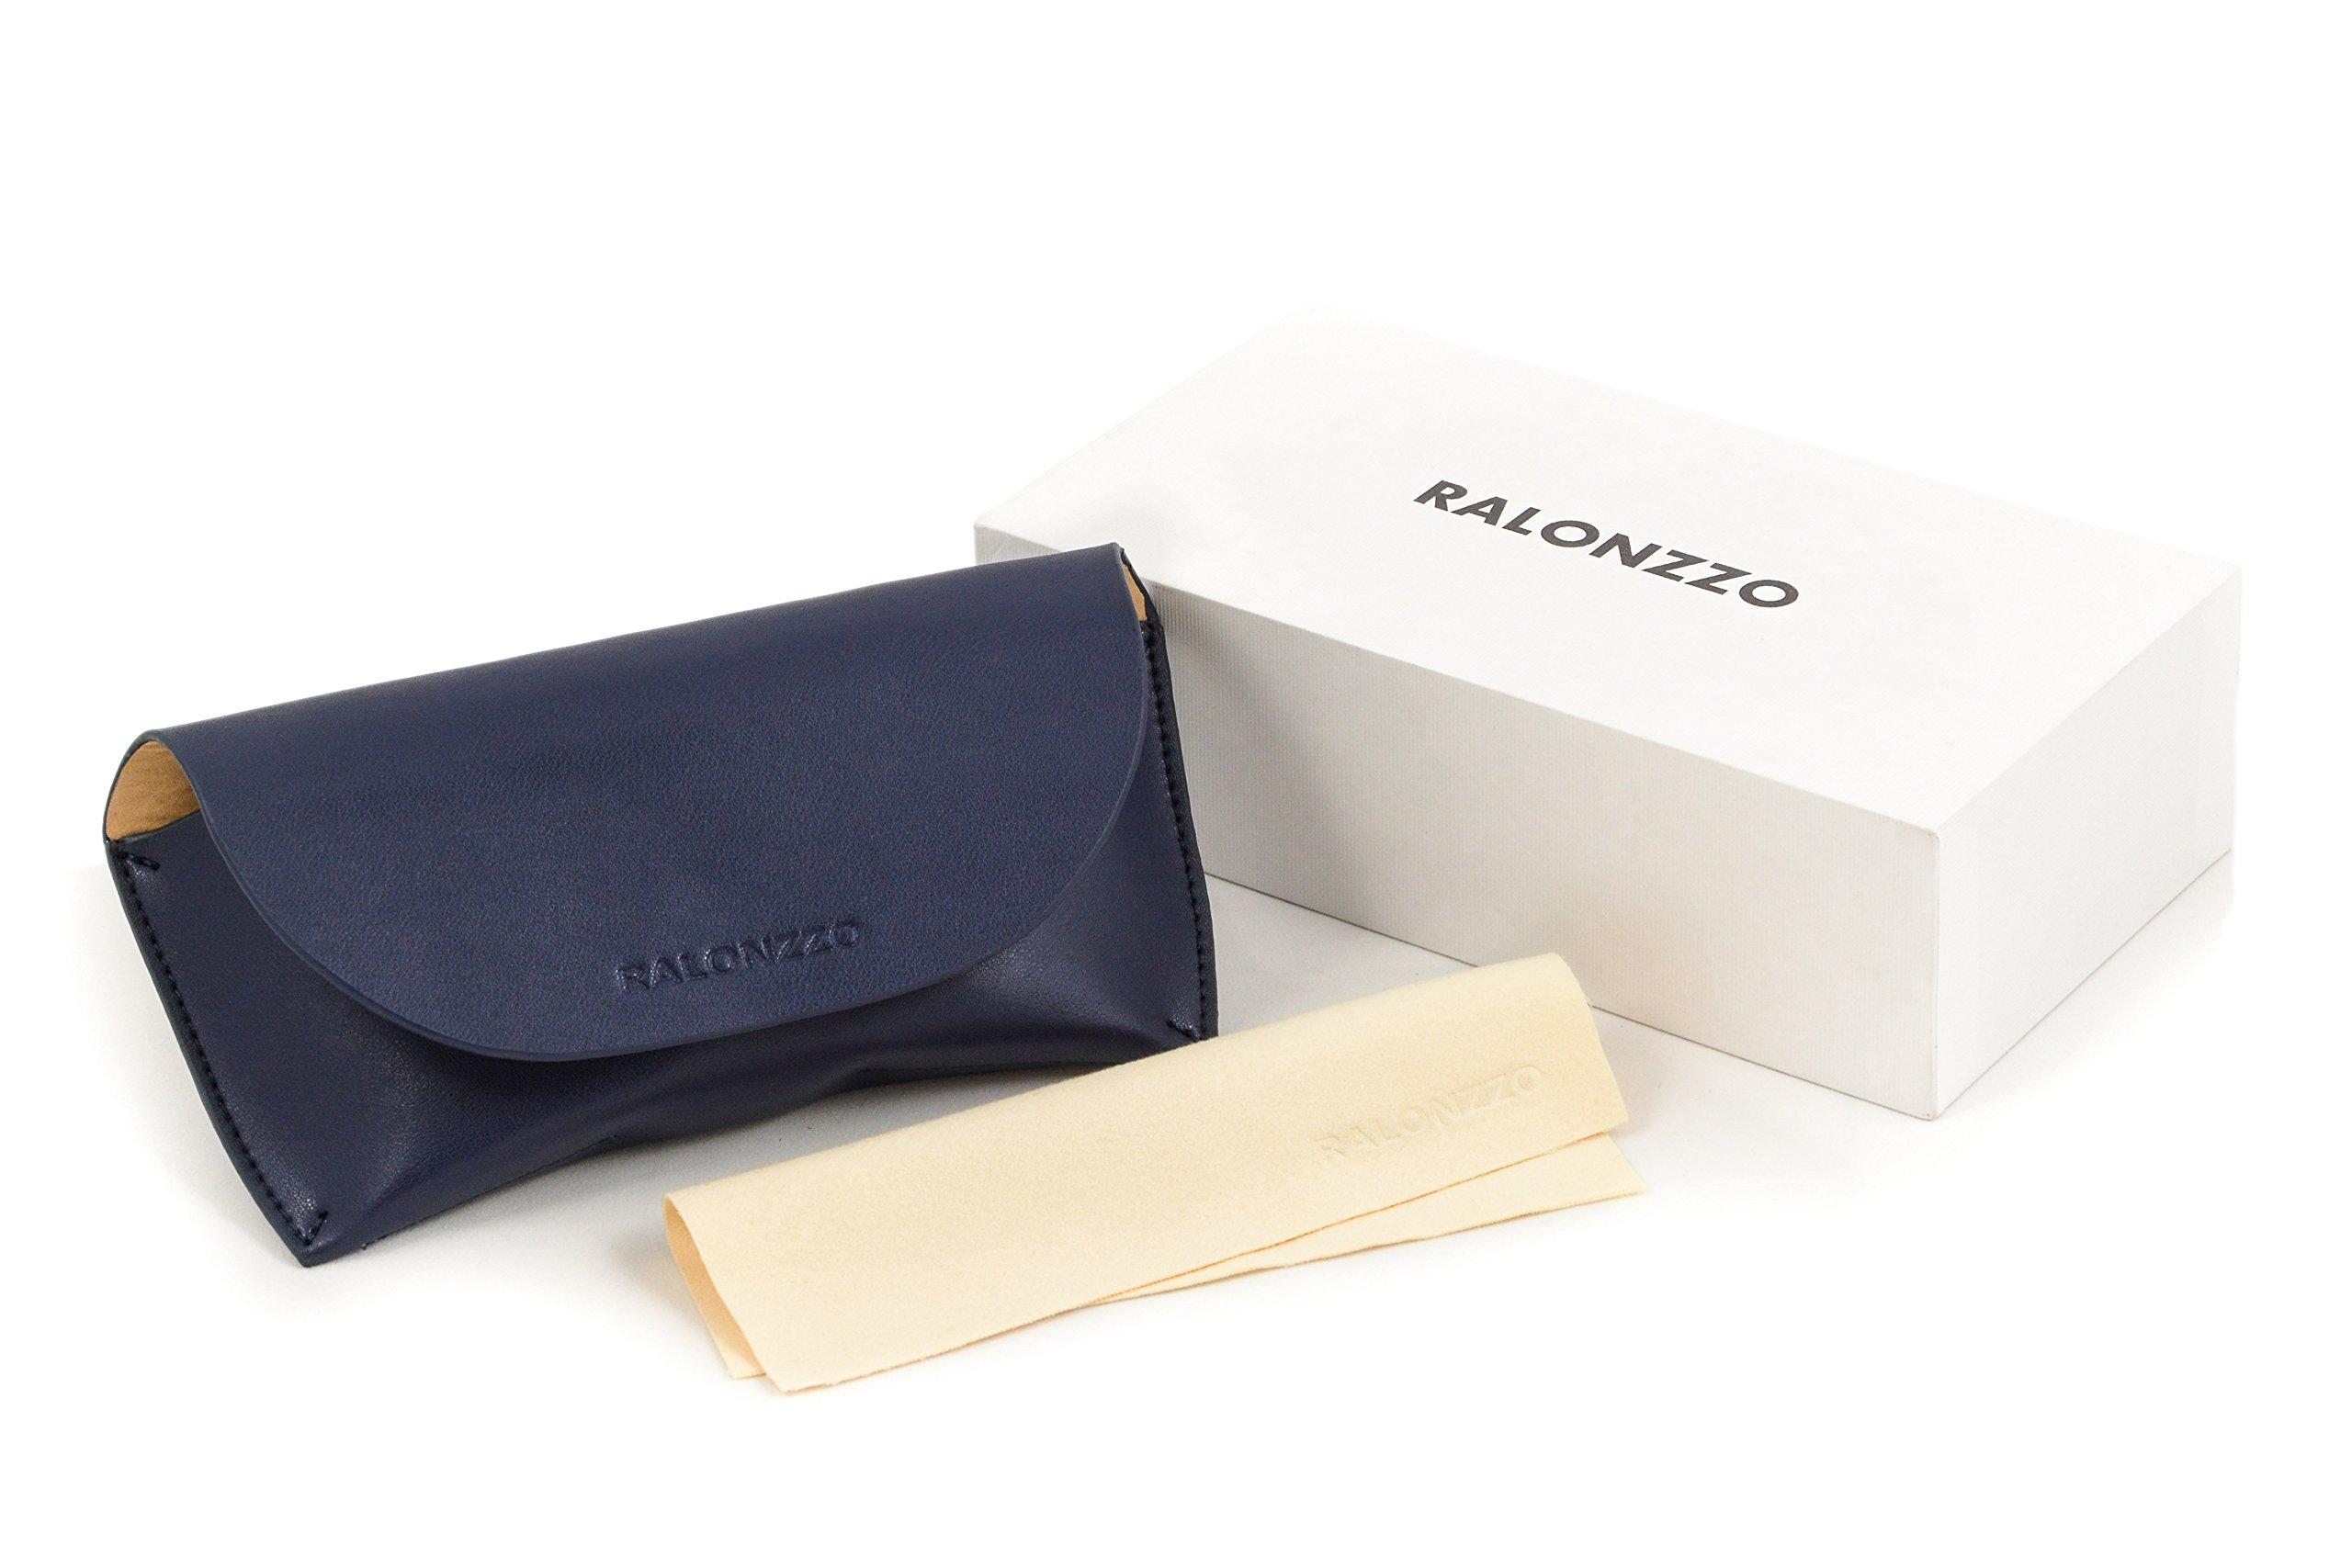 Premium Leather Glasses Case by RALONZZO - For Men & Women, Sunglasses & Eyeglasses, Universal Size (Blue Graphite) by RALONZZO